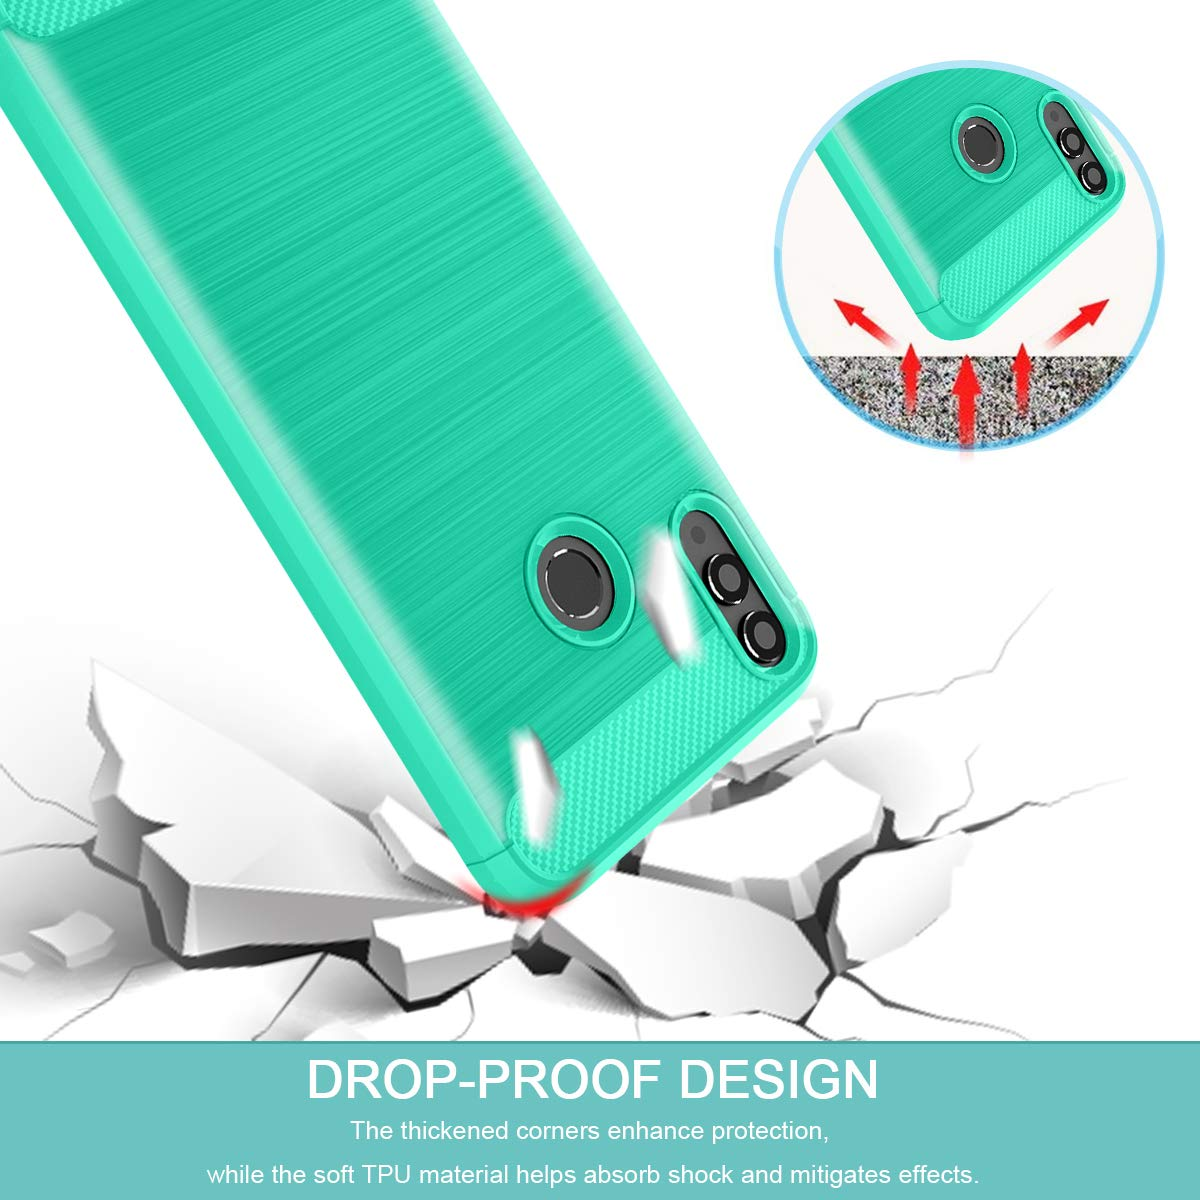 Amazon.com: Honor 8X Case,Honor 8S Case,CaseRoo Carbon Fiber Soft TPU Phone Case Brushed Texture Anti-Fingerprint Flexible Full-Body Protective Cover Shell ...